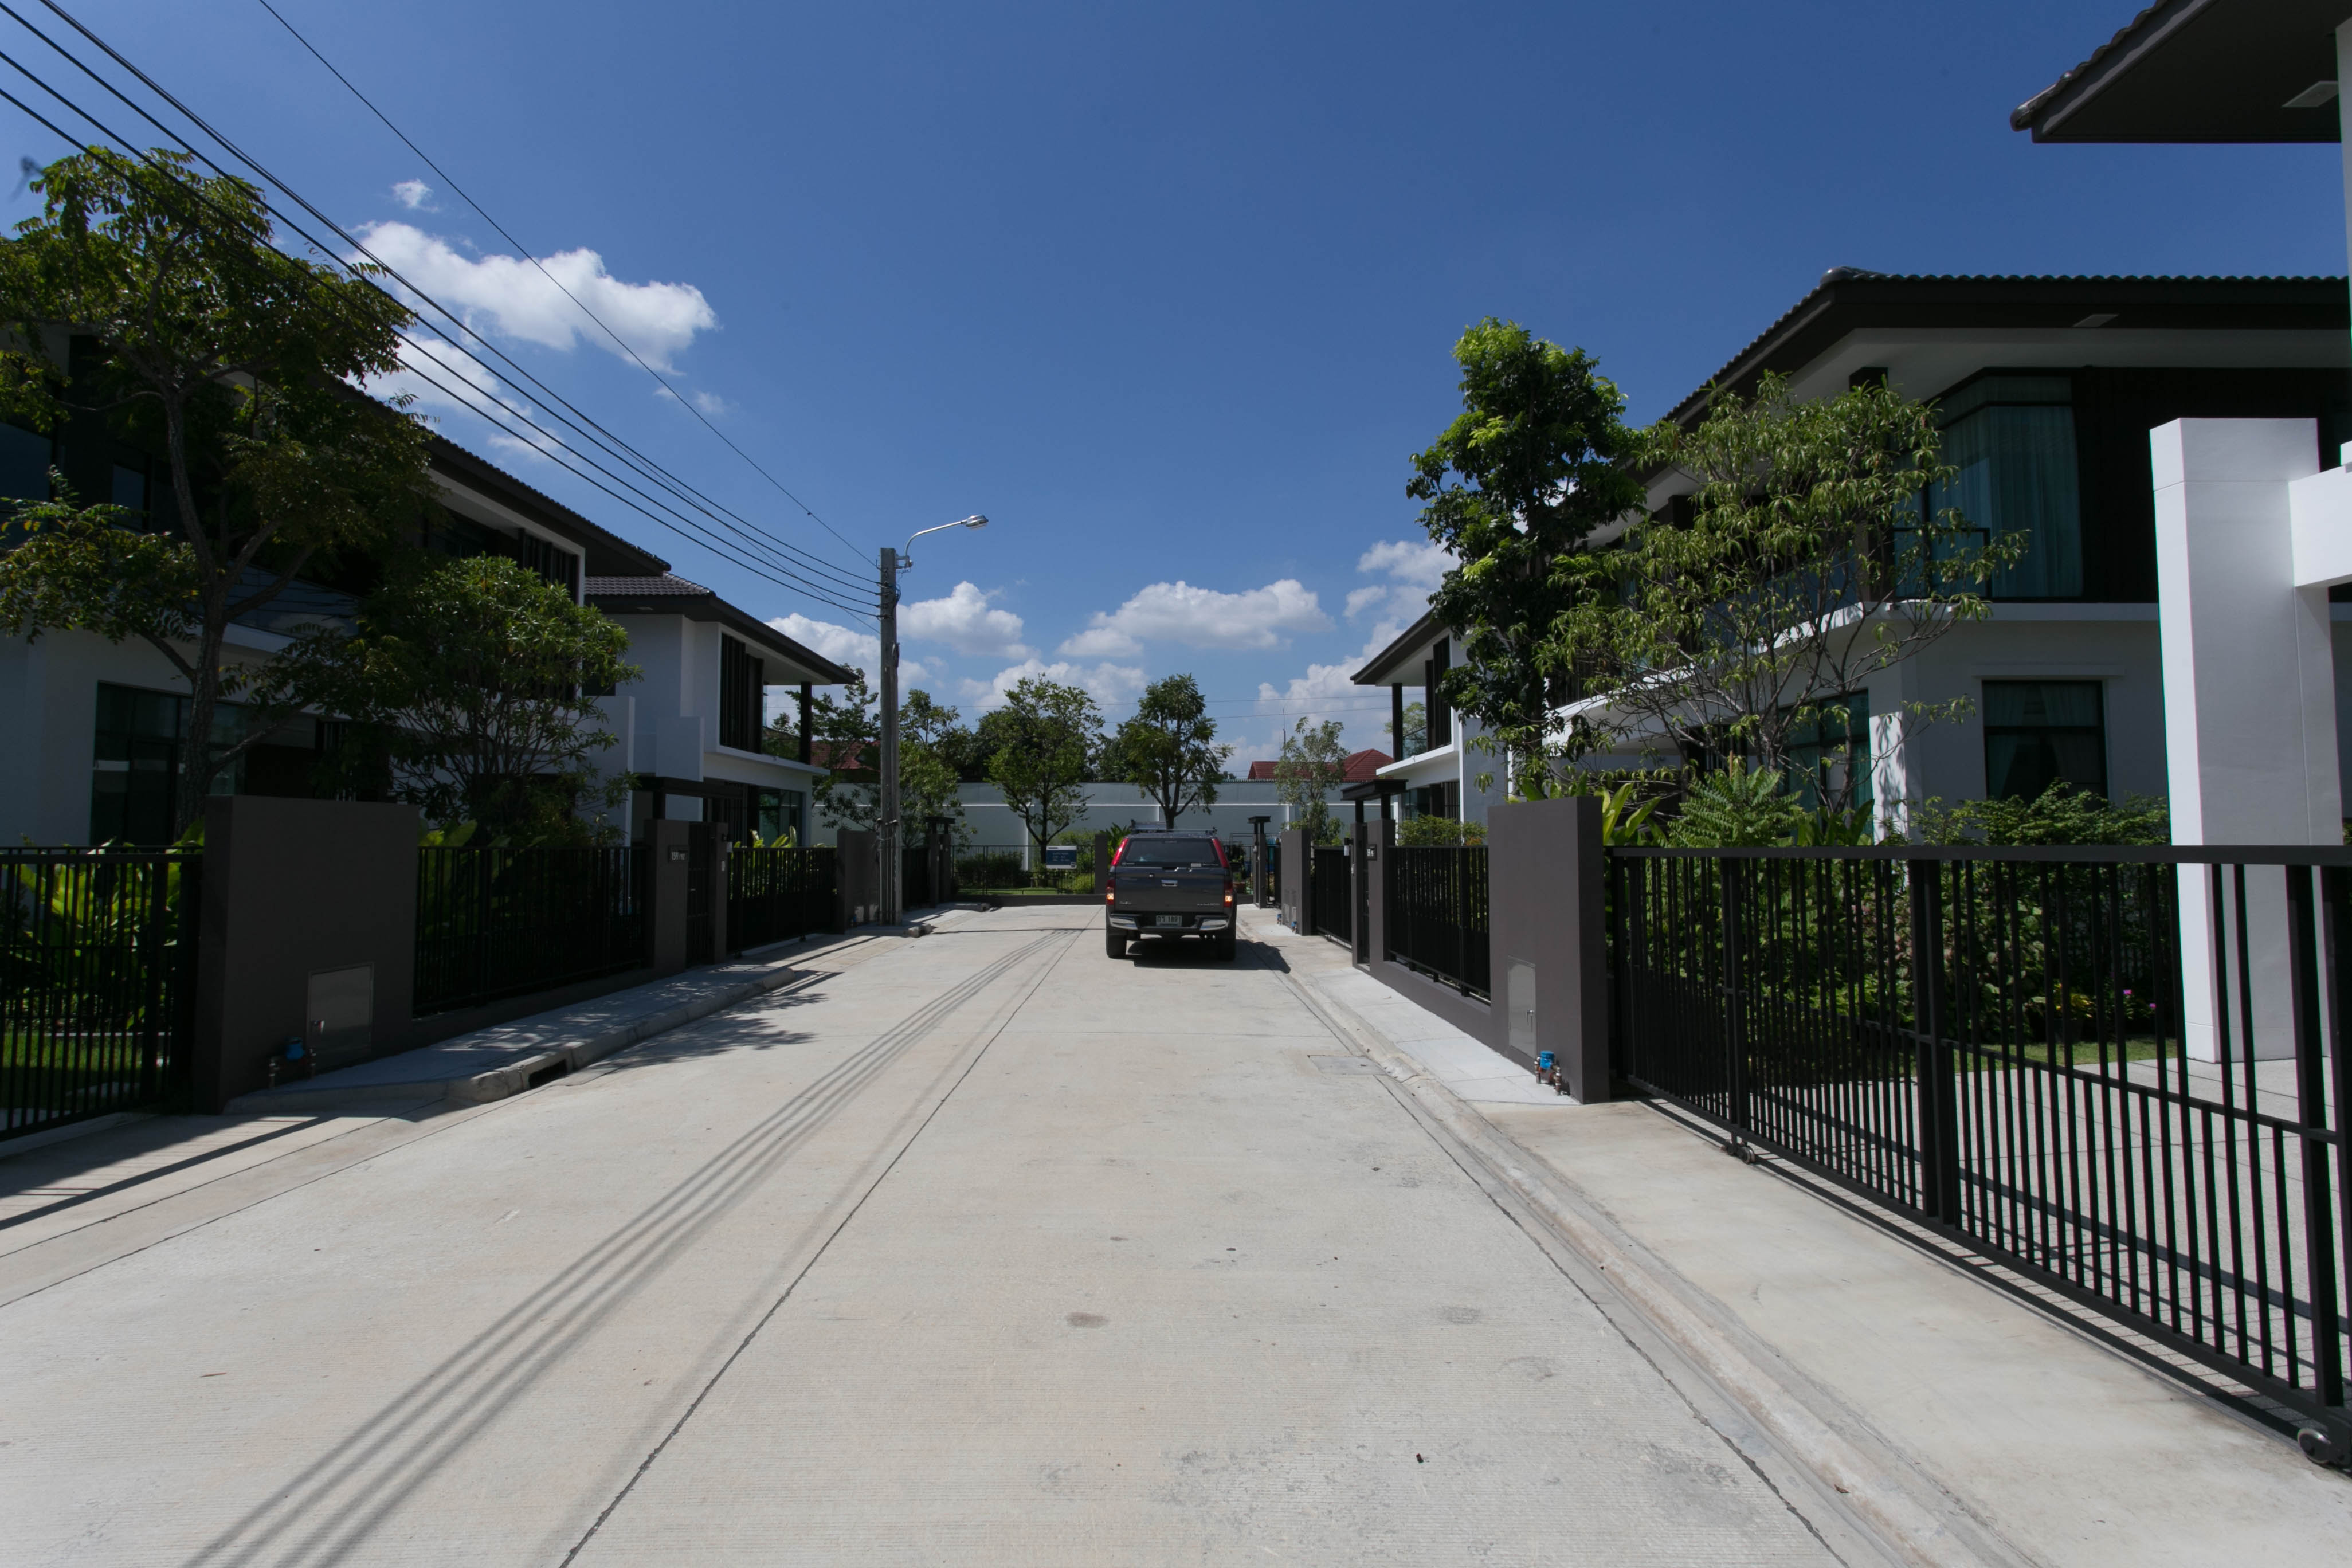 l-IMG_0250-ไปติดผ้าม่านบ้านทรง Spazio โดย Land and house